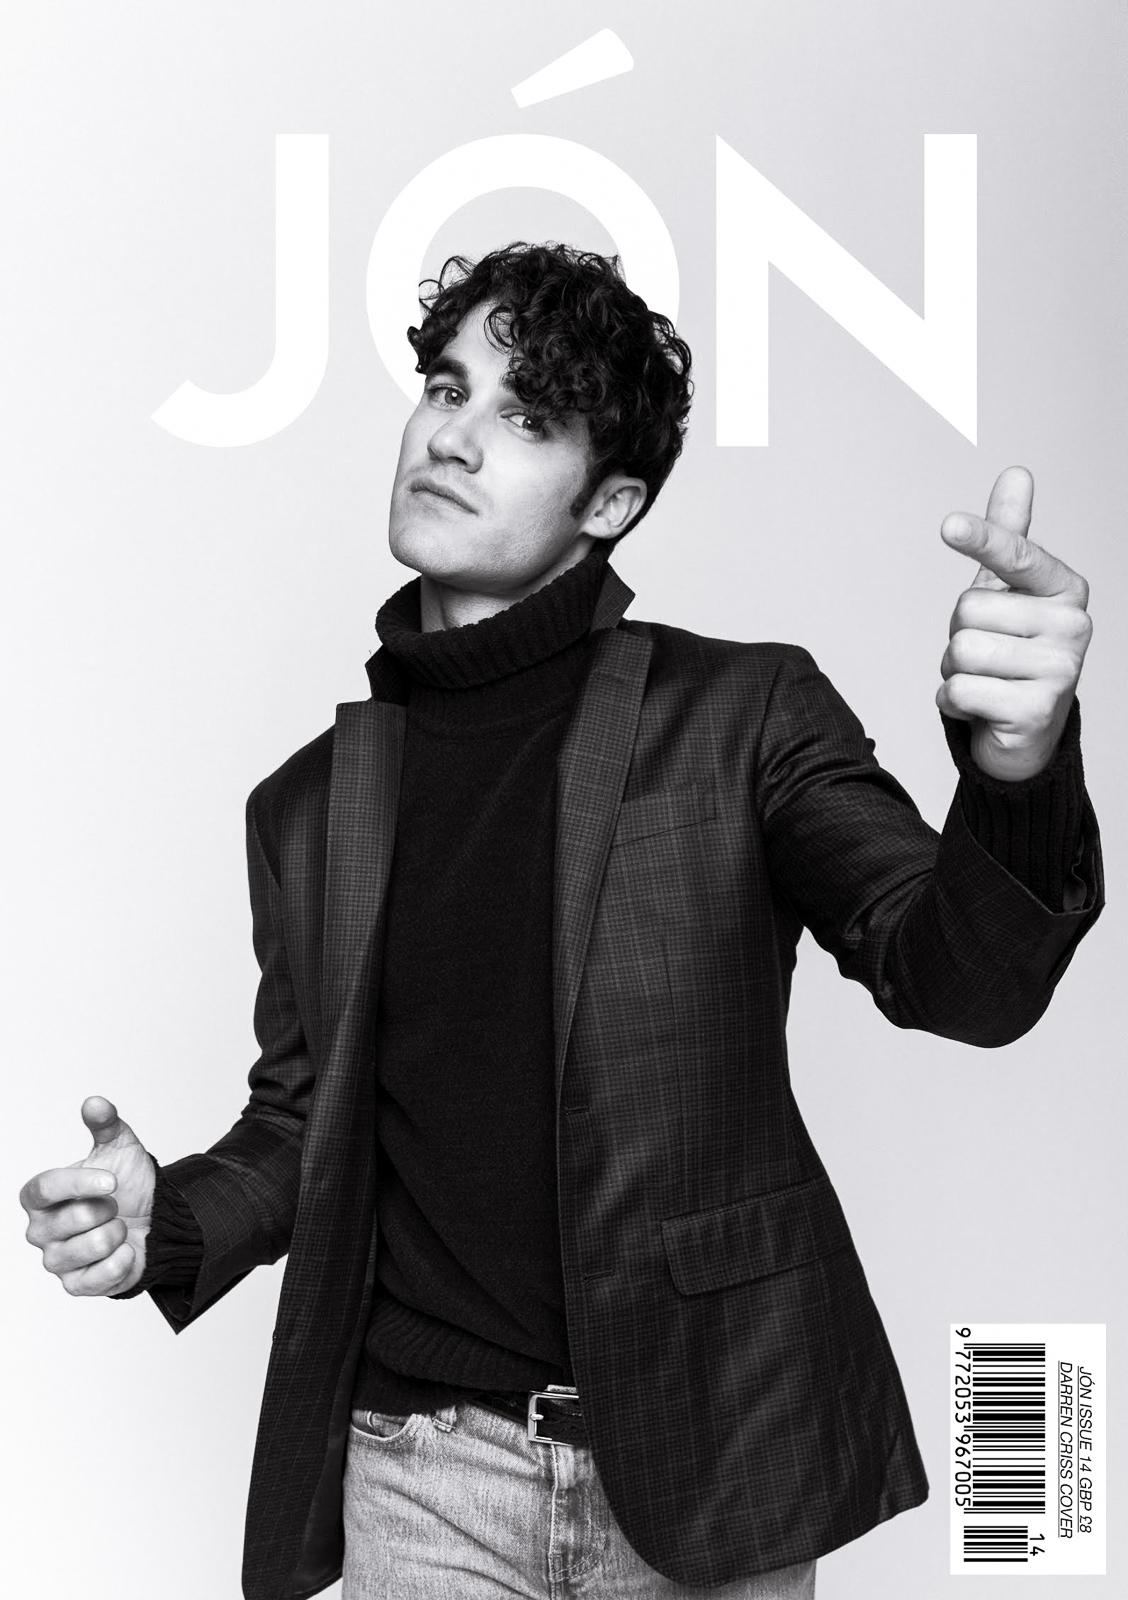 Darren Criss Cover - Ted Sun Photo-1.jpg